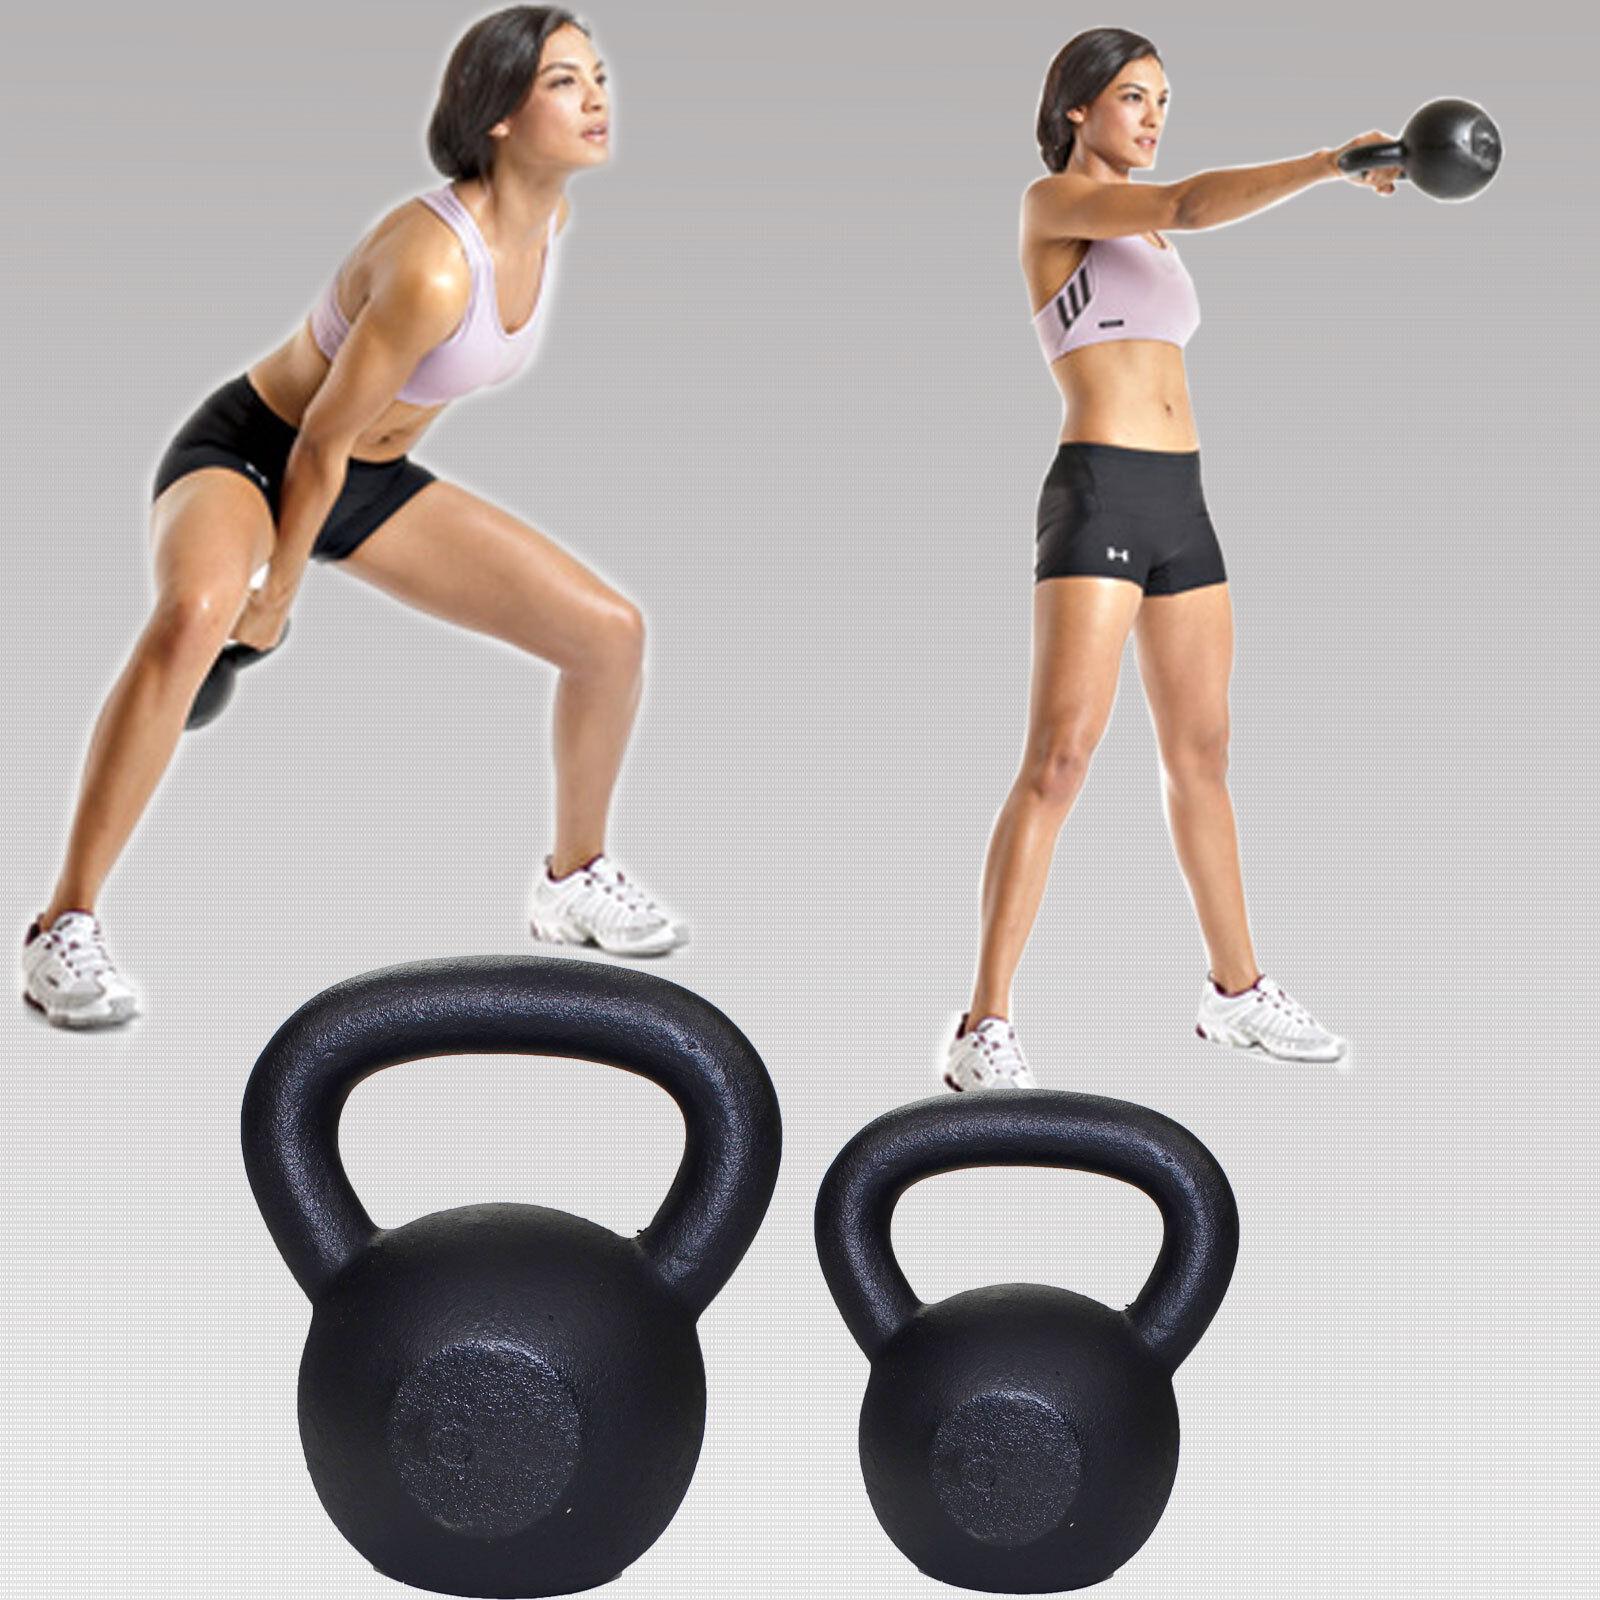 Paire de Bouilloire Bell 12 & 16 kg fonte kettlebell poids cloches gym exercice